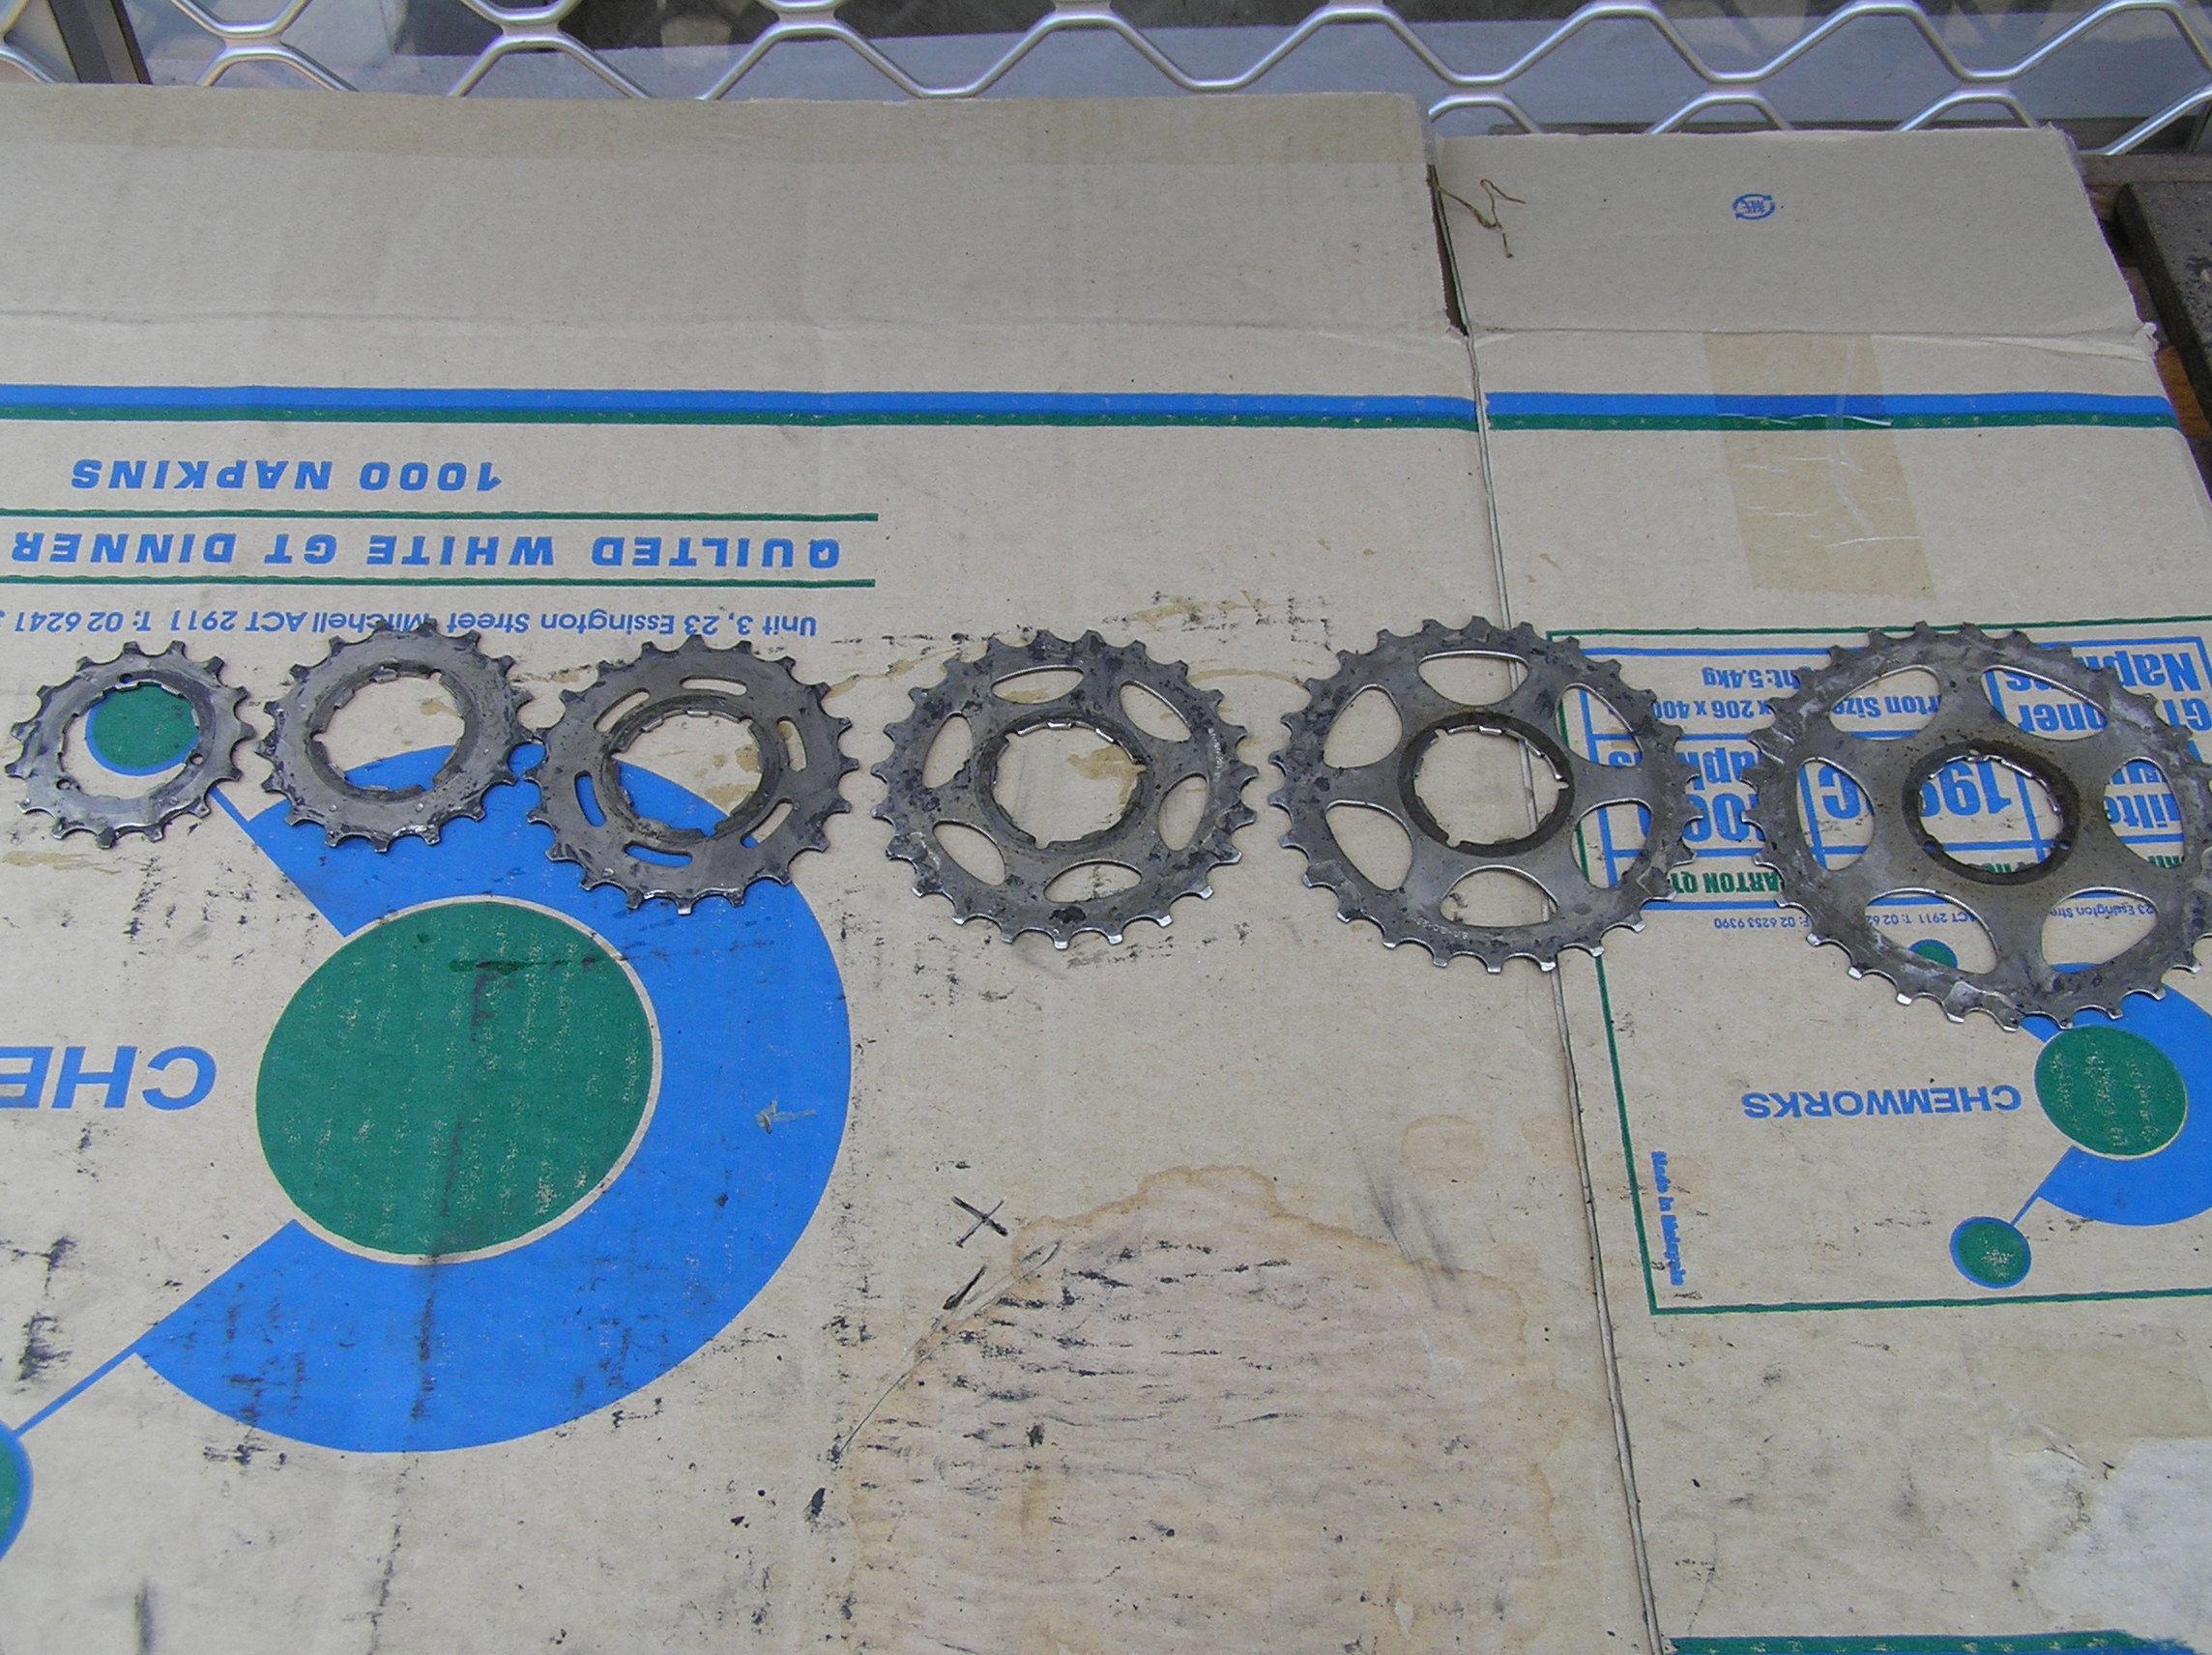 Taking apart a bike's rear cluster